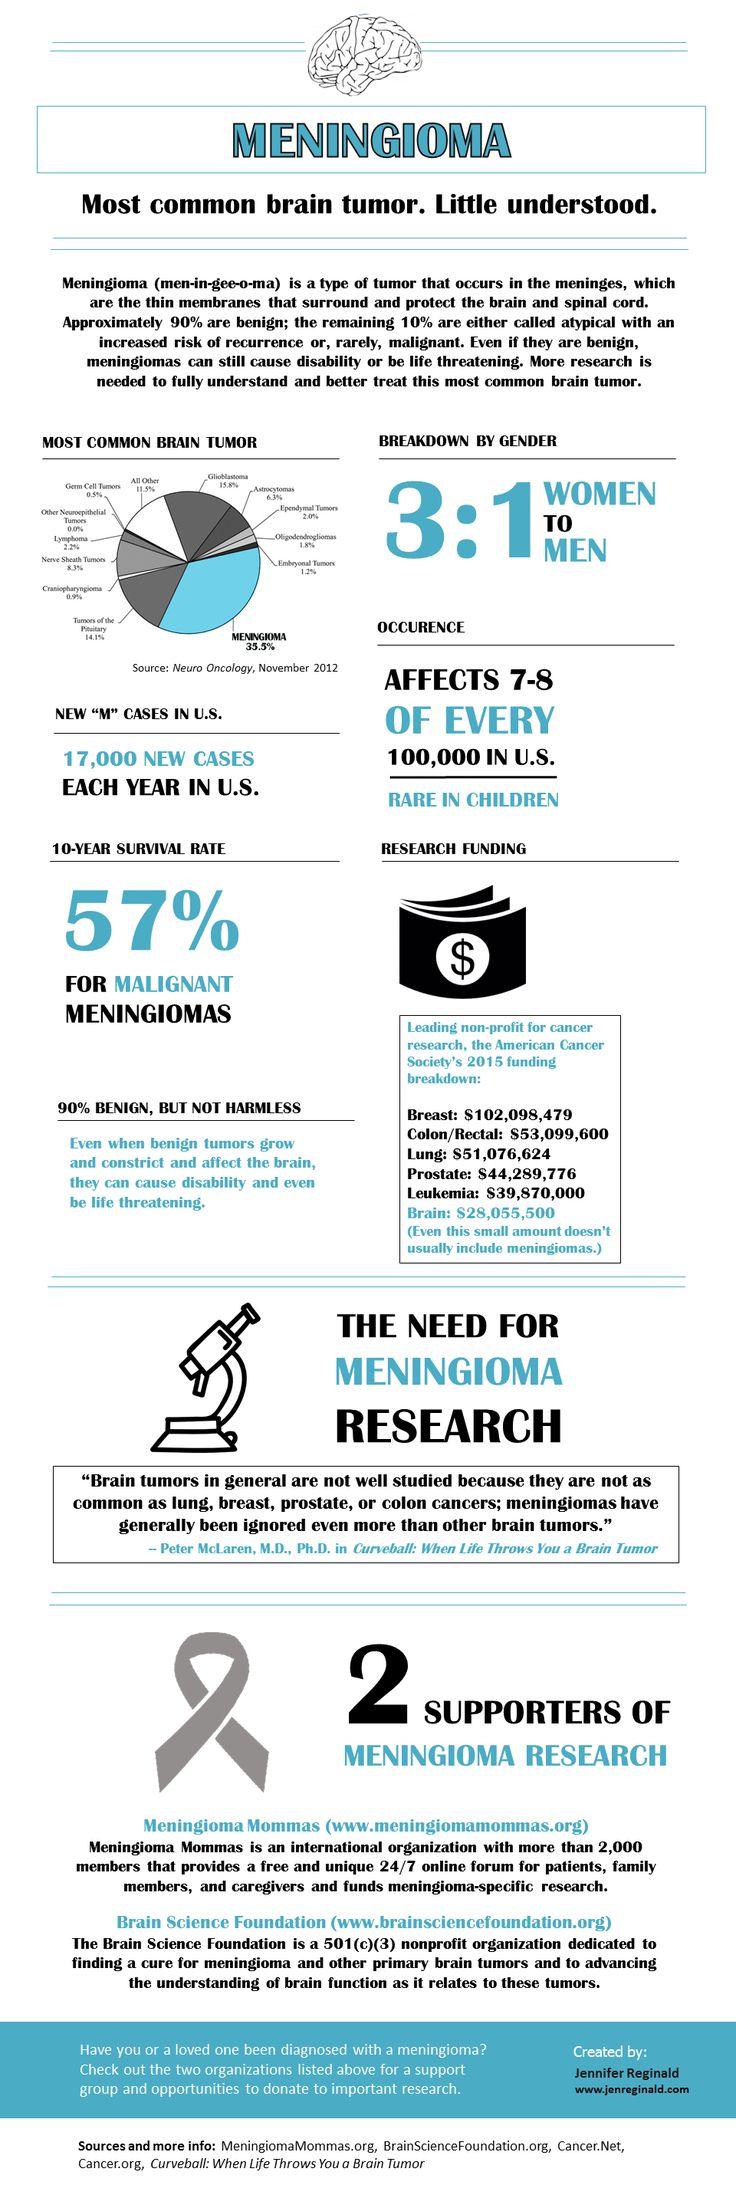 Meningioma infographic